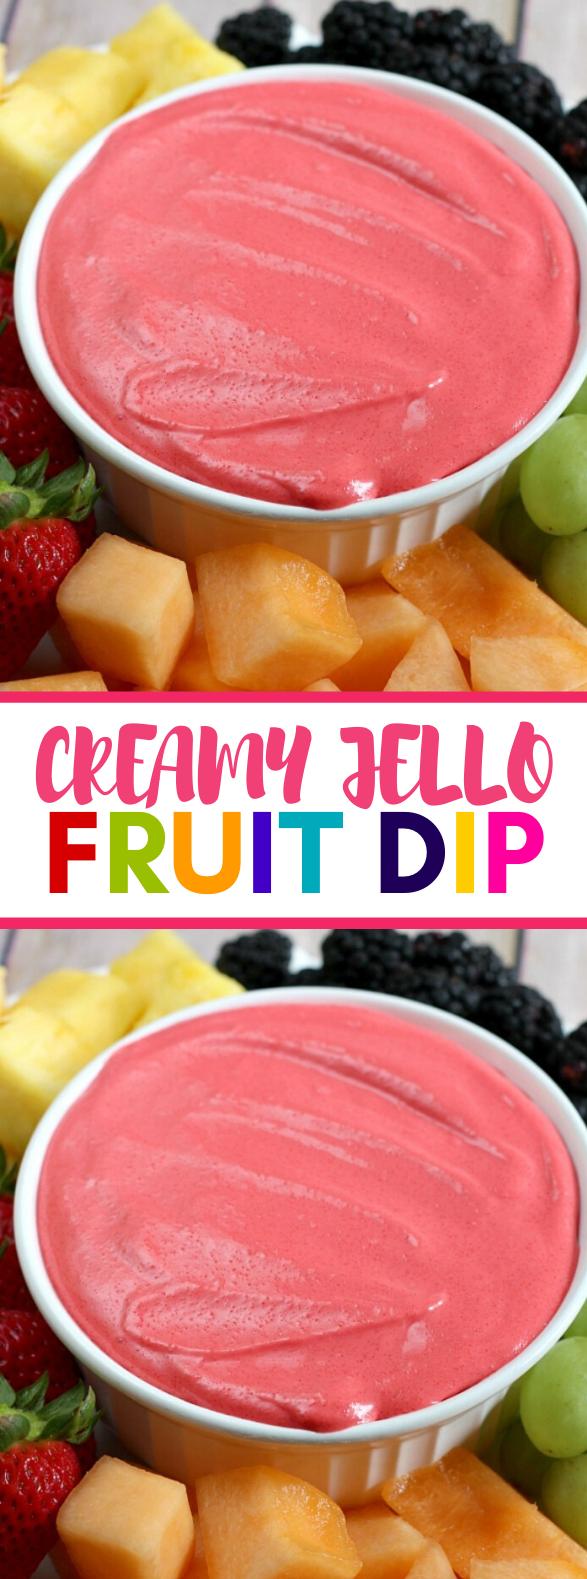 CREAMY JELLO FRUIT DIP #sweets #desserts